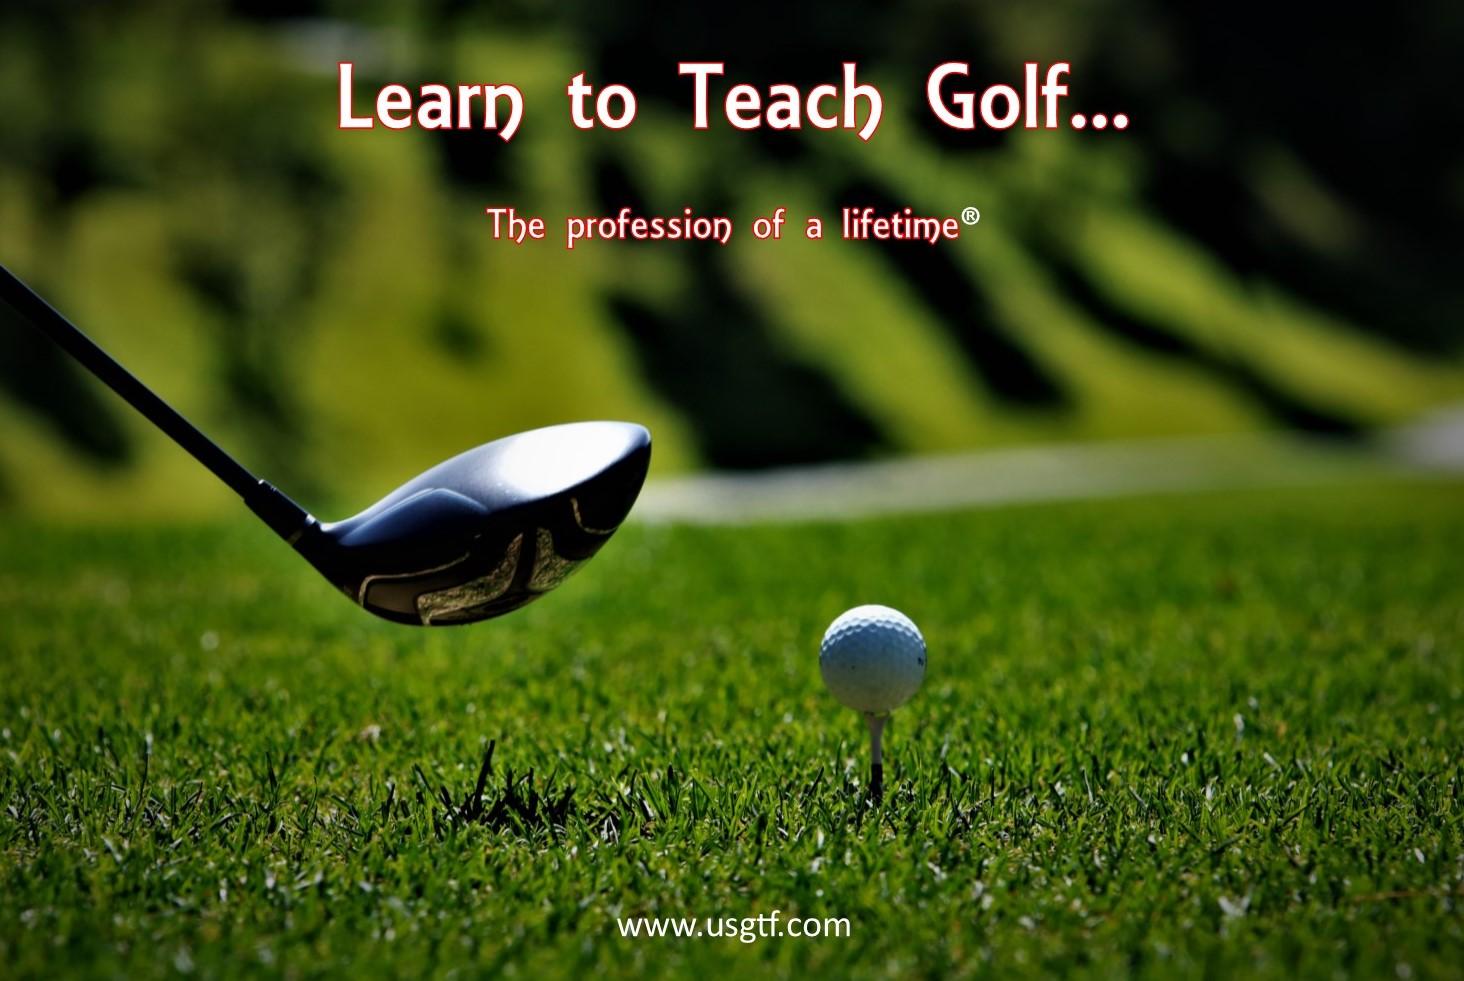 United States Golf Teachers Federation image 2